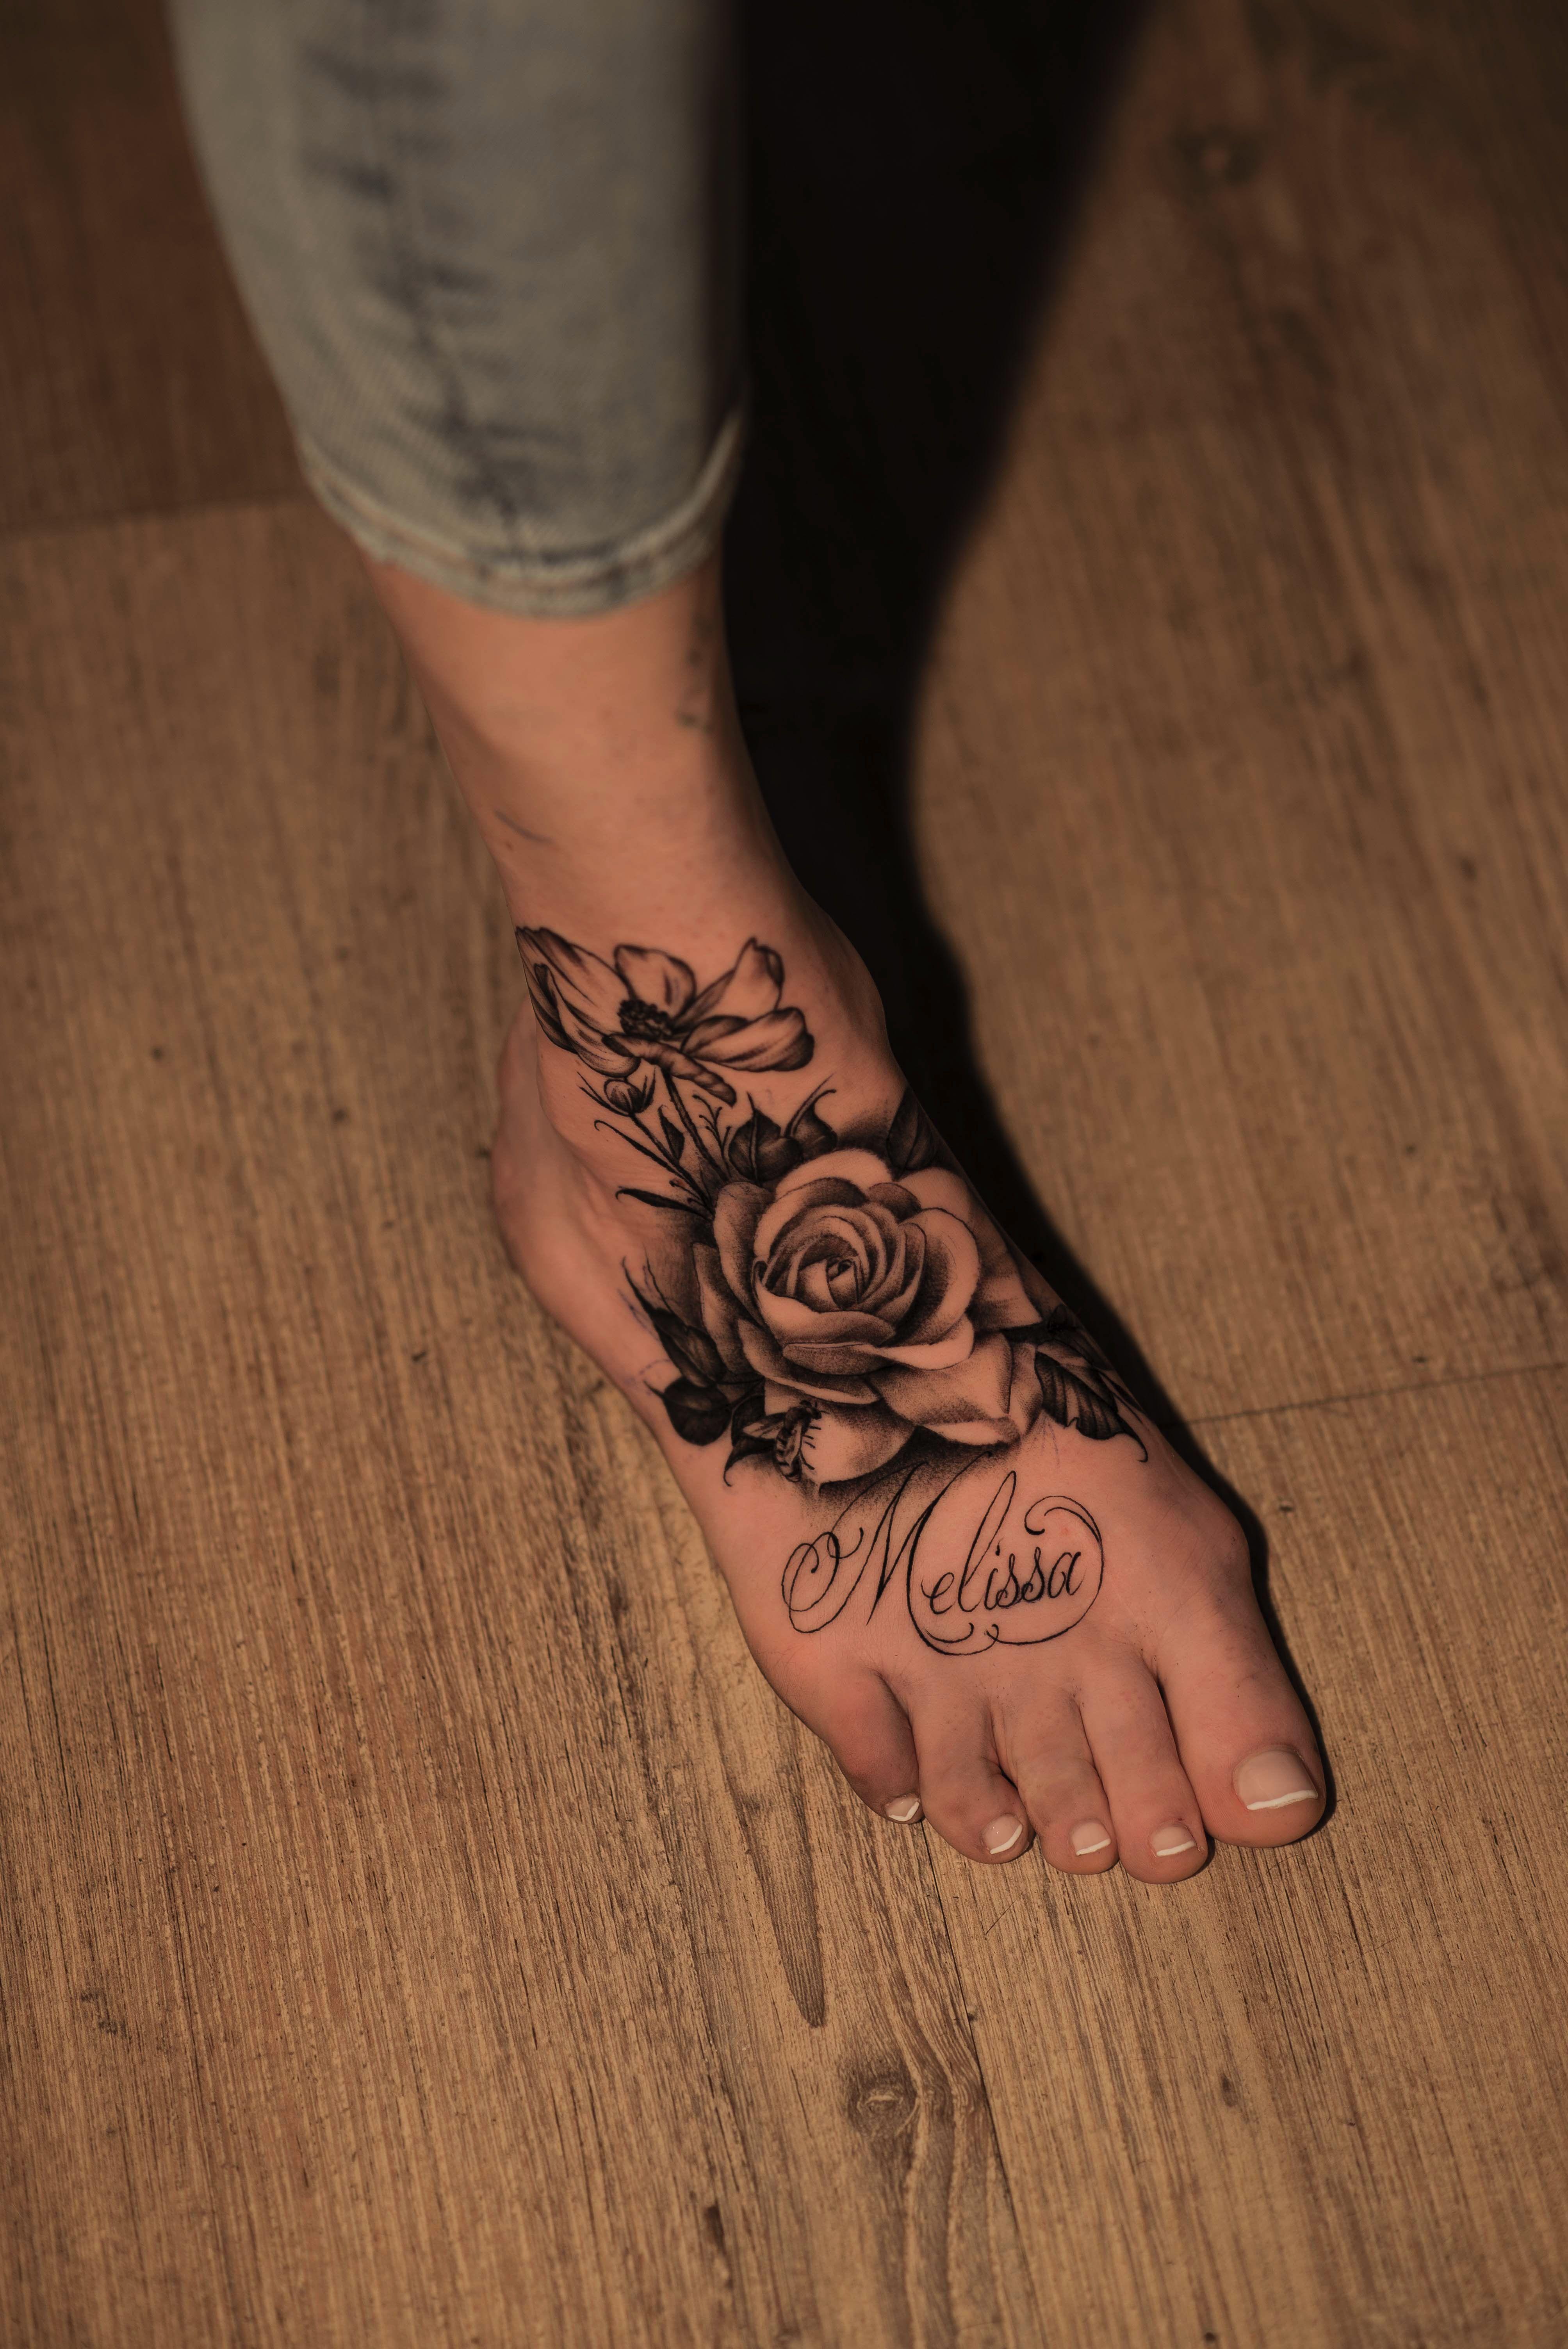 Foot Tattoos For Women Foot Tattoos Girls Tattoos For Women Flowers Foot Tattoos